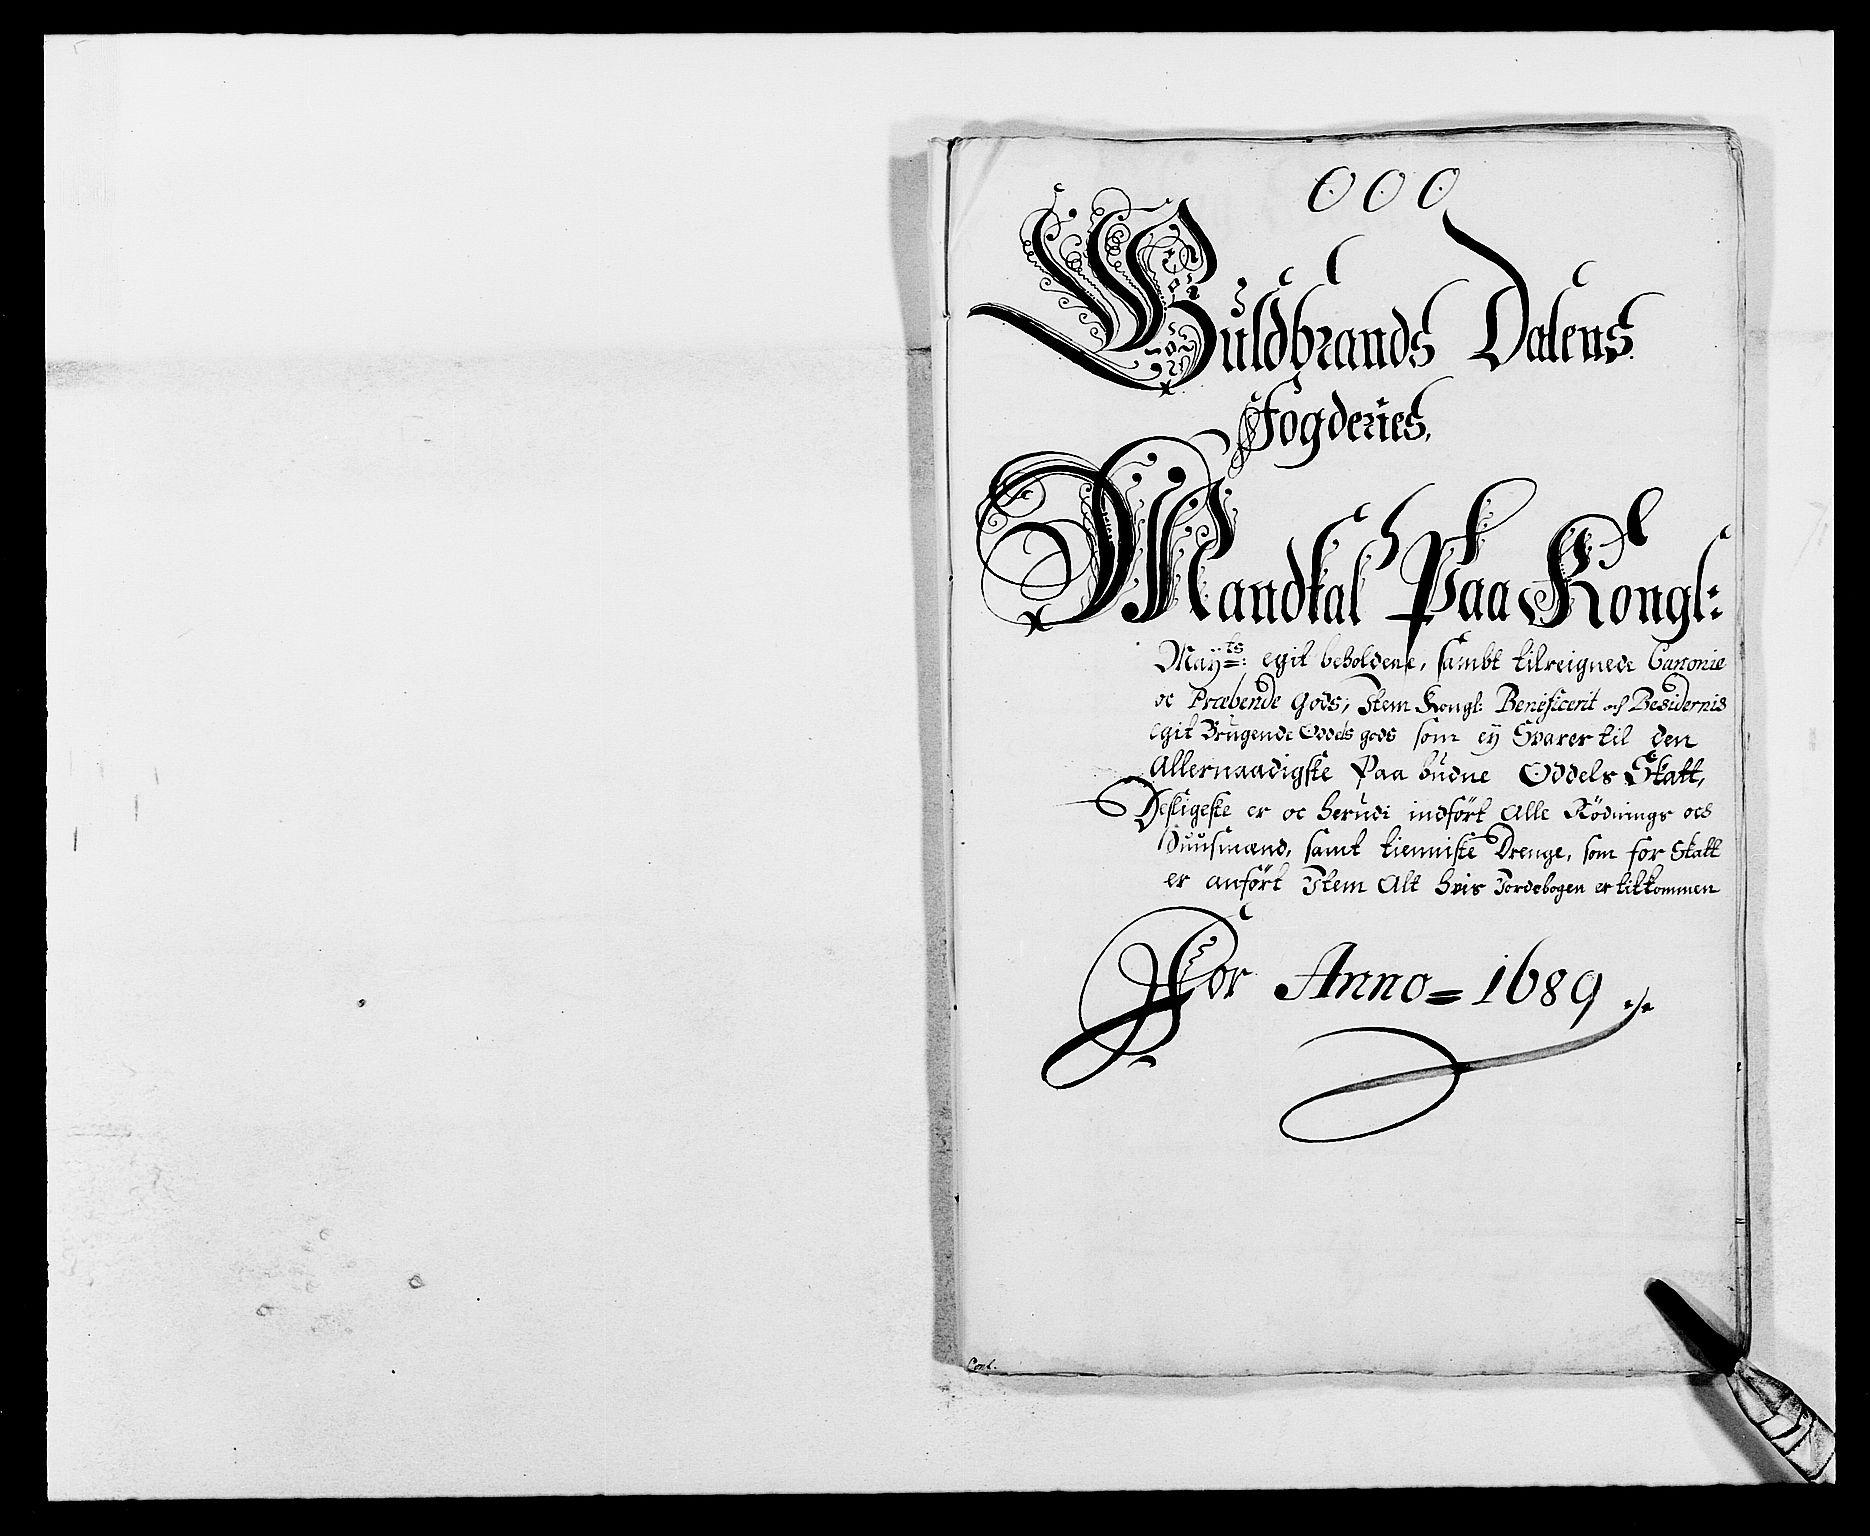 RA, Rentekammeret inntil 1814, Reviderte regnskaper, Fogderegnskap, R17/L1164: Fogderegnskap Gudbrandsdal, 1682-1689, s. 90